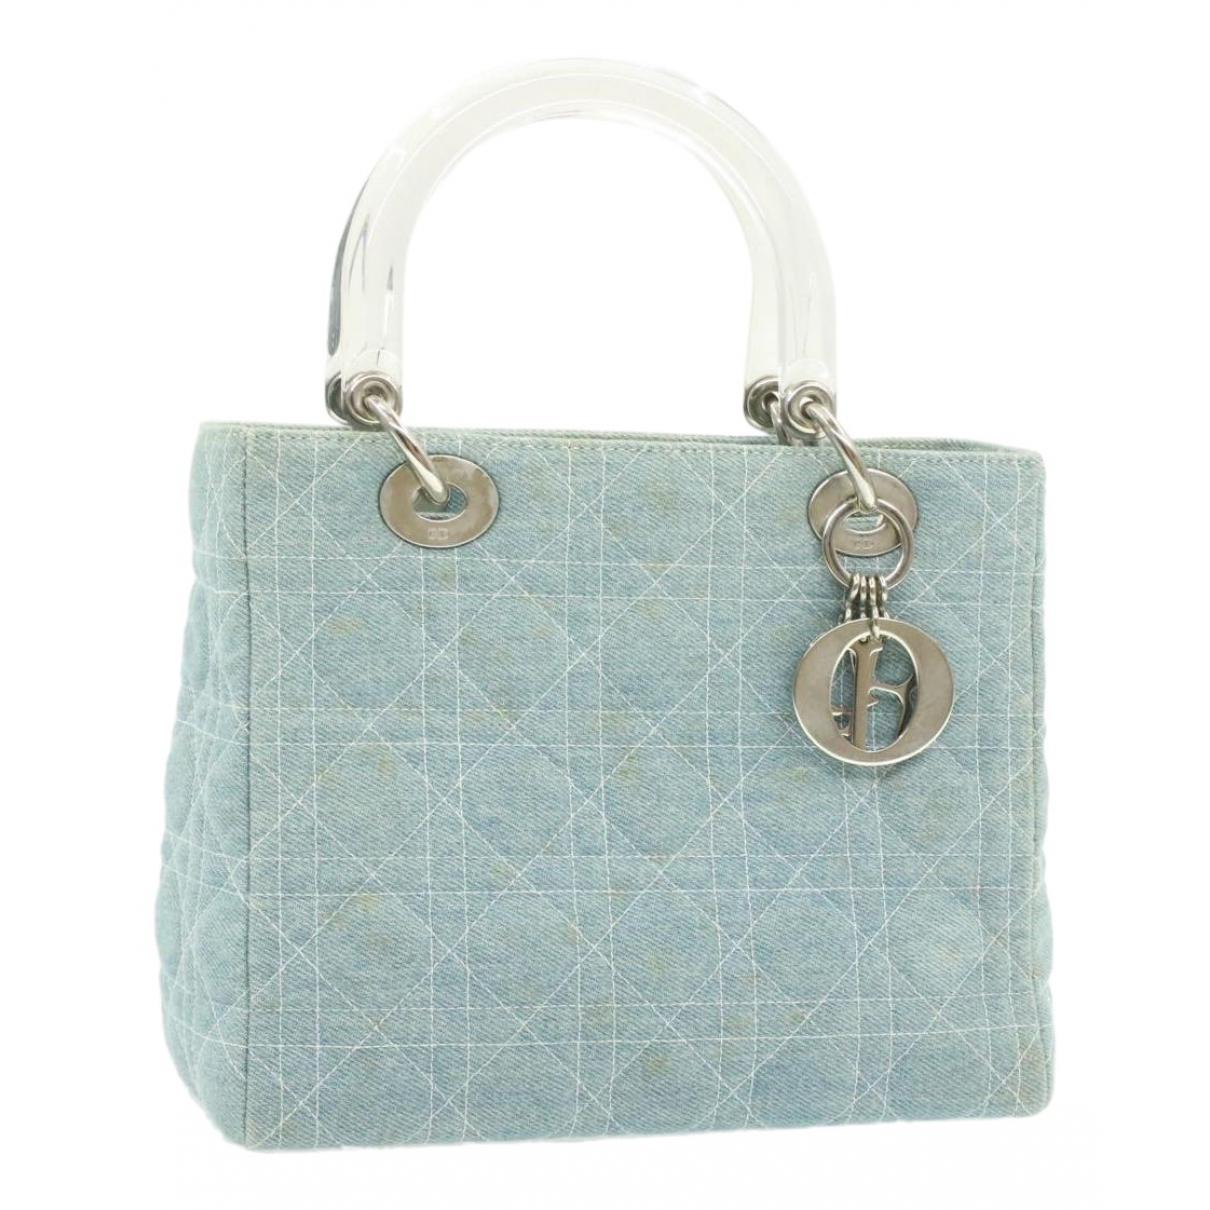 Dior N Blue Denim - Jeans handbag for Women N